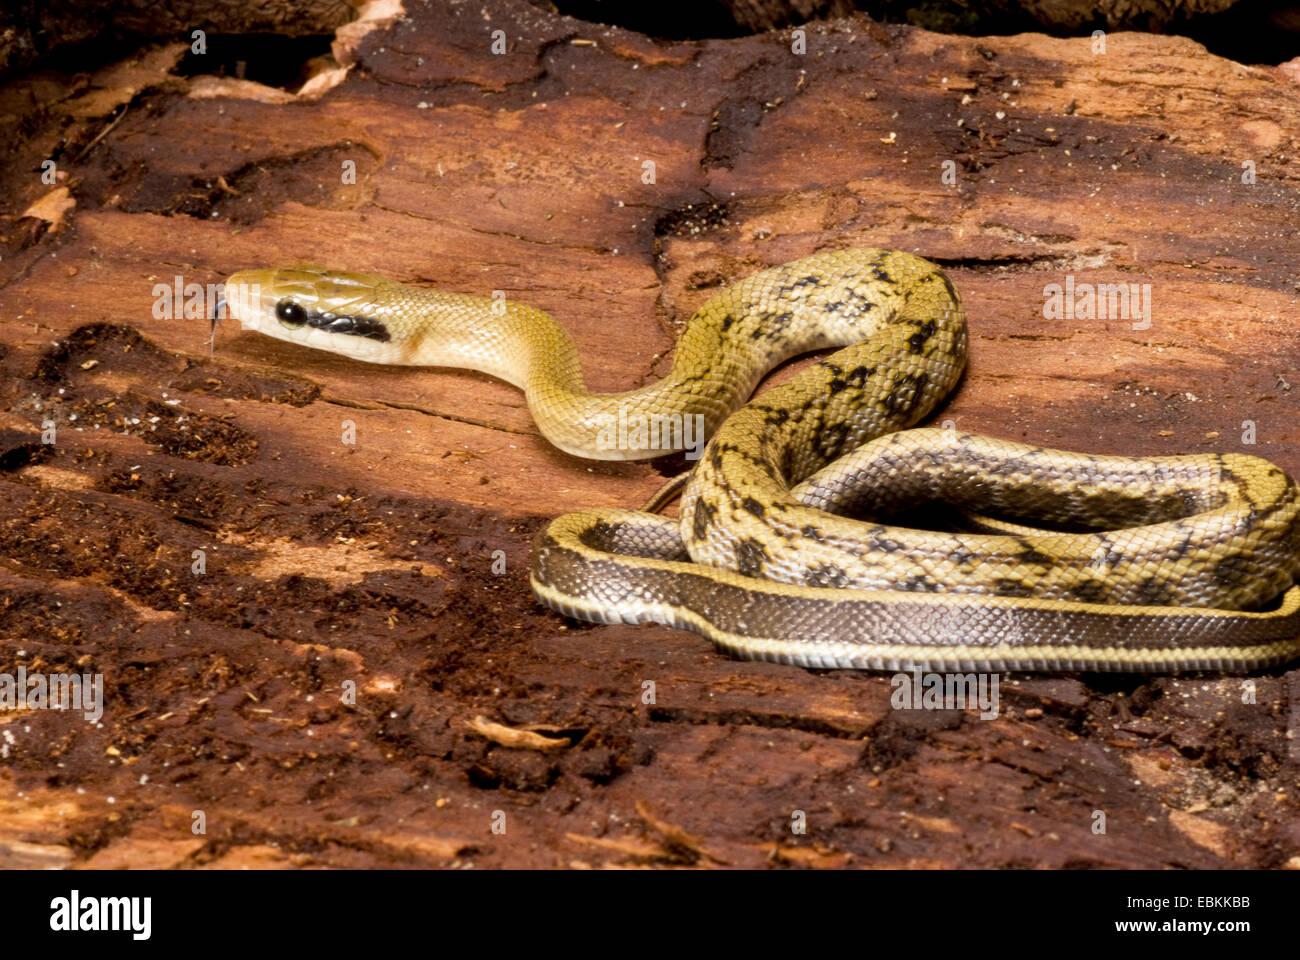 Taiwan bellezza snake, bellezza Snake (Elaphe taeniura, Orthriophis taeniurus taeniurus), arrotolati Immagini Stock